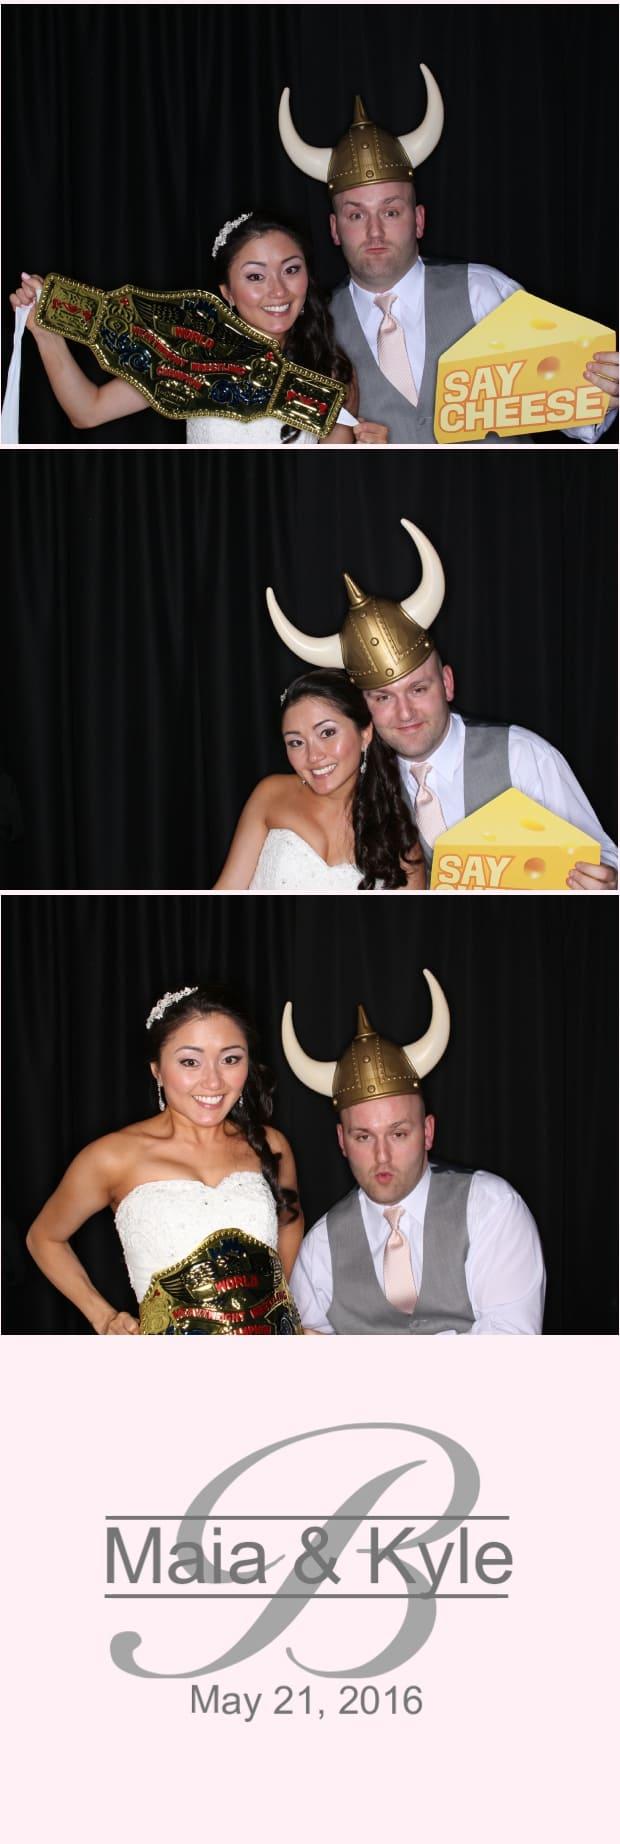 Kyle & Maia's Wedding 5/21/16